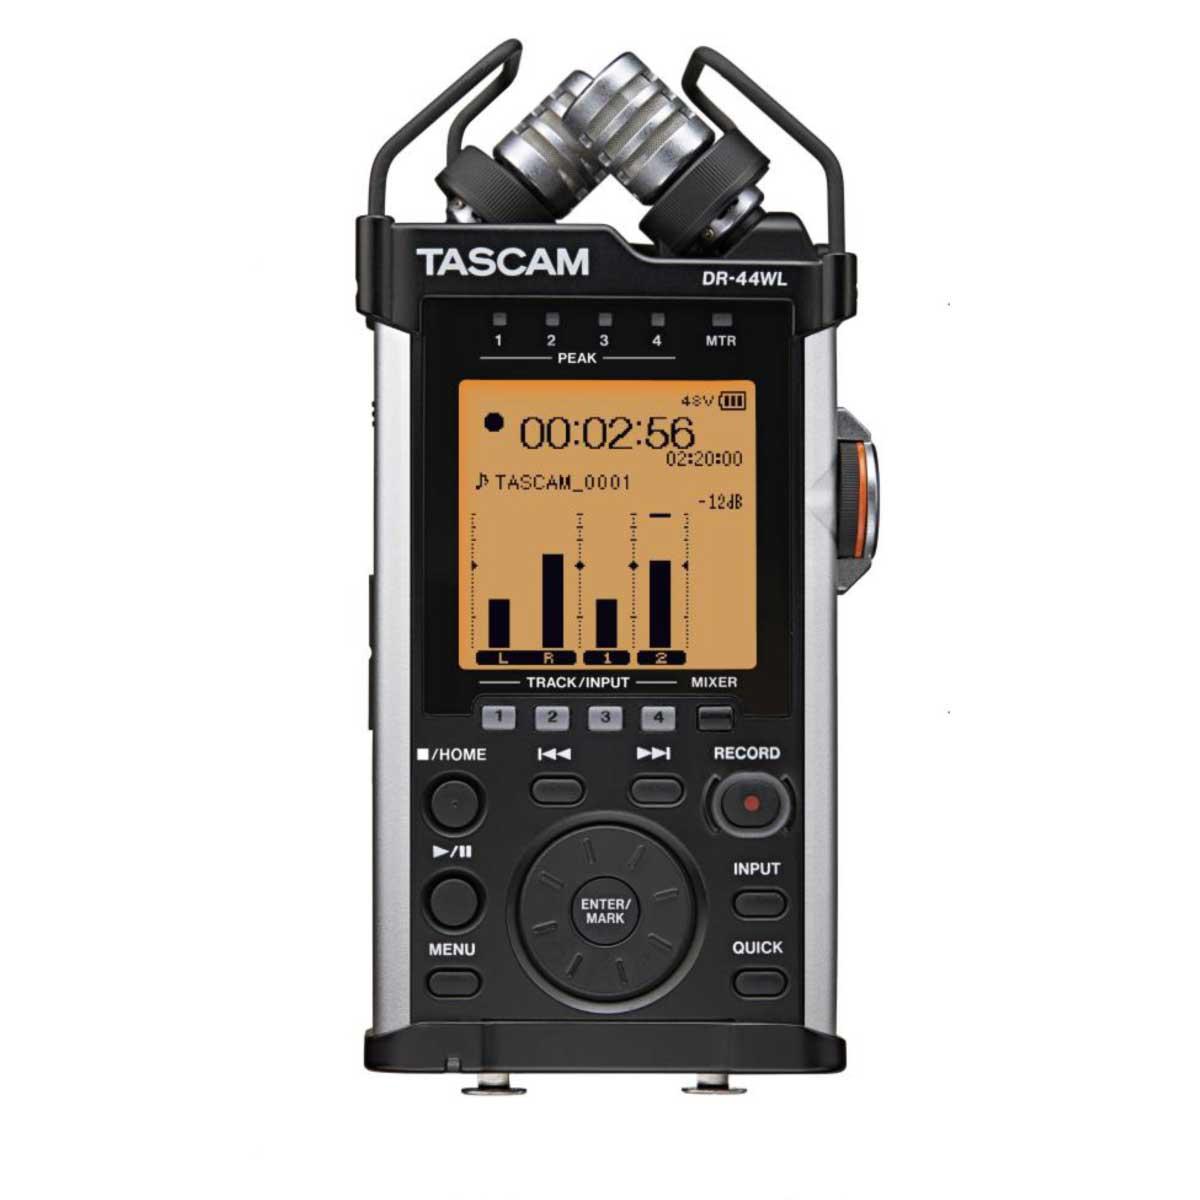 TASCAM タスカム / DR-44WL VER2-J モバイルレコーダー【お取り寄せ商品】